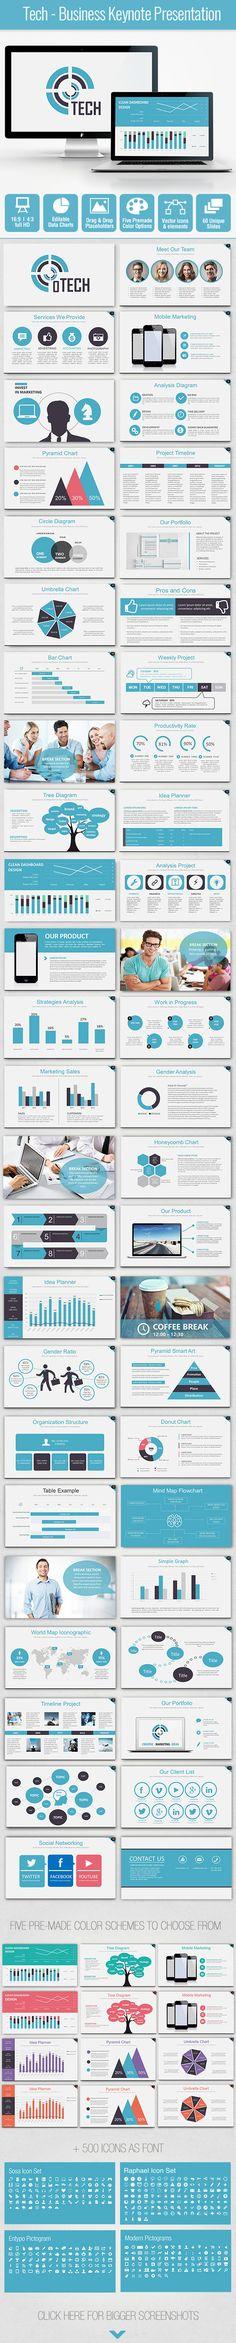 Tech - Business Keynote Presentation Template #slides #design Download: http://graphicriver.net/item/tech-business-keynote-presentation/13461600?ref=ksioks